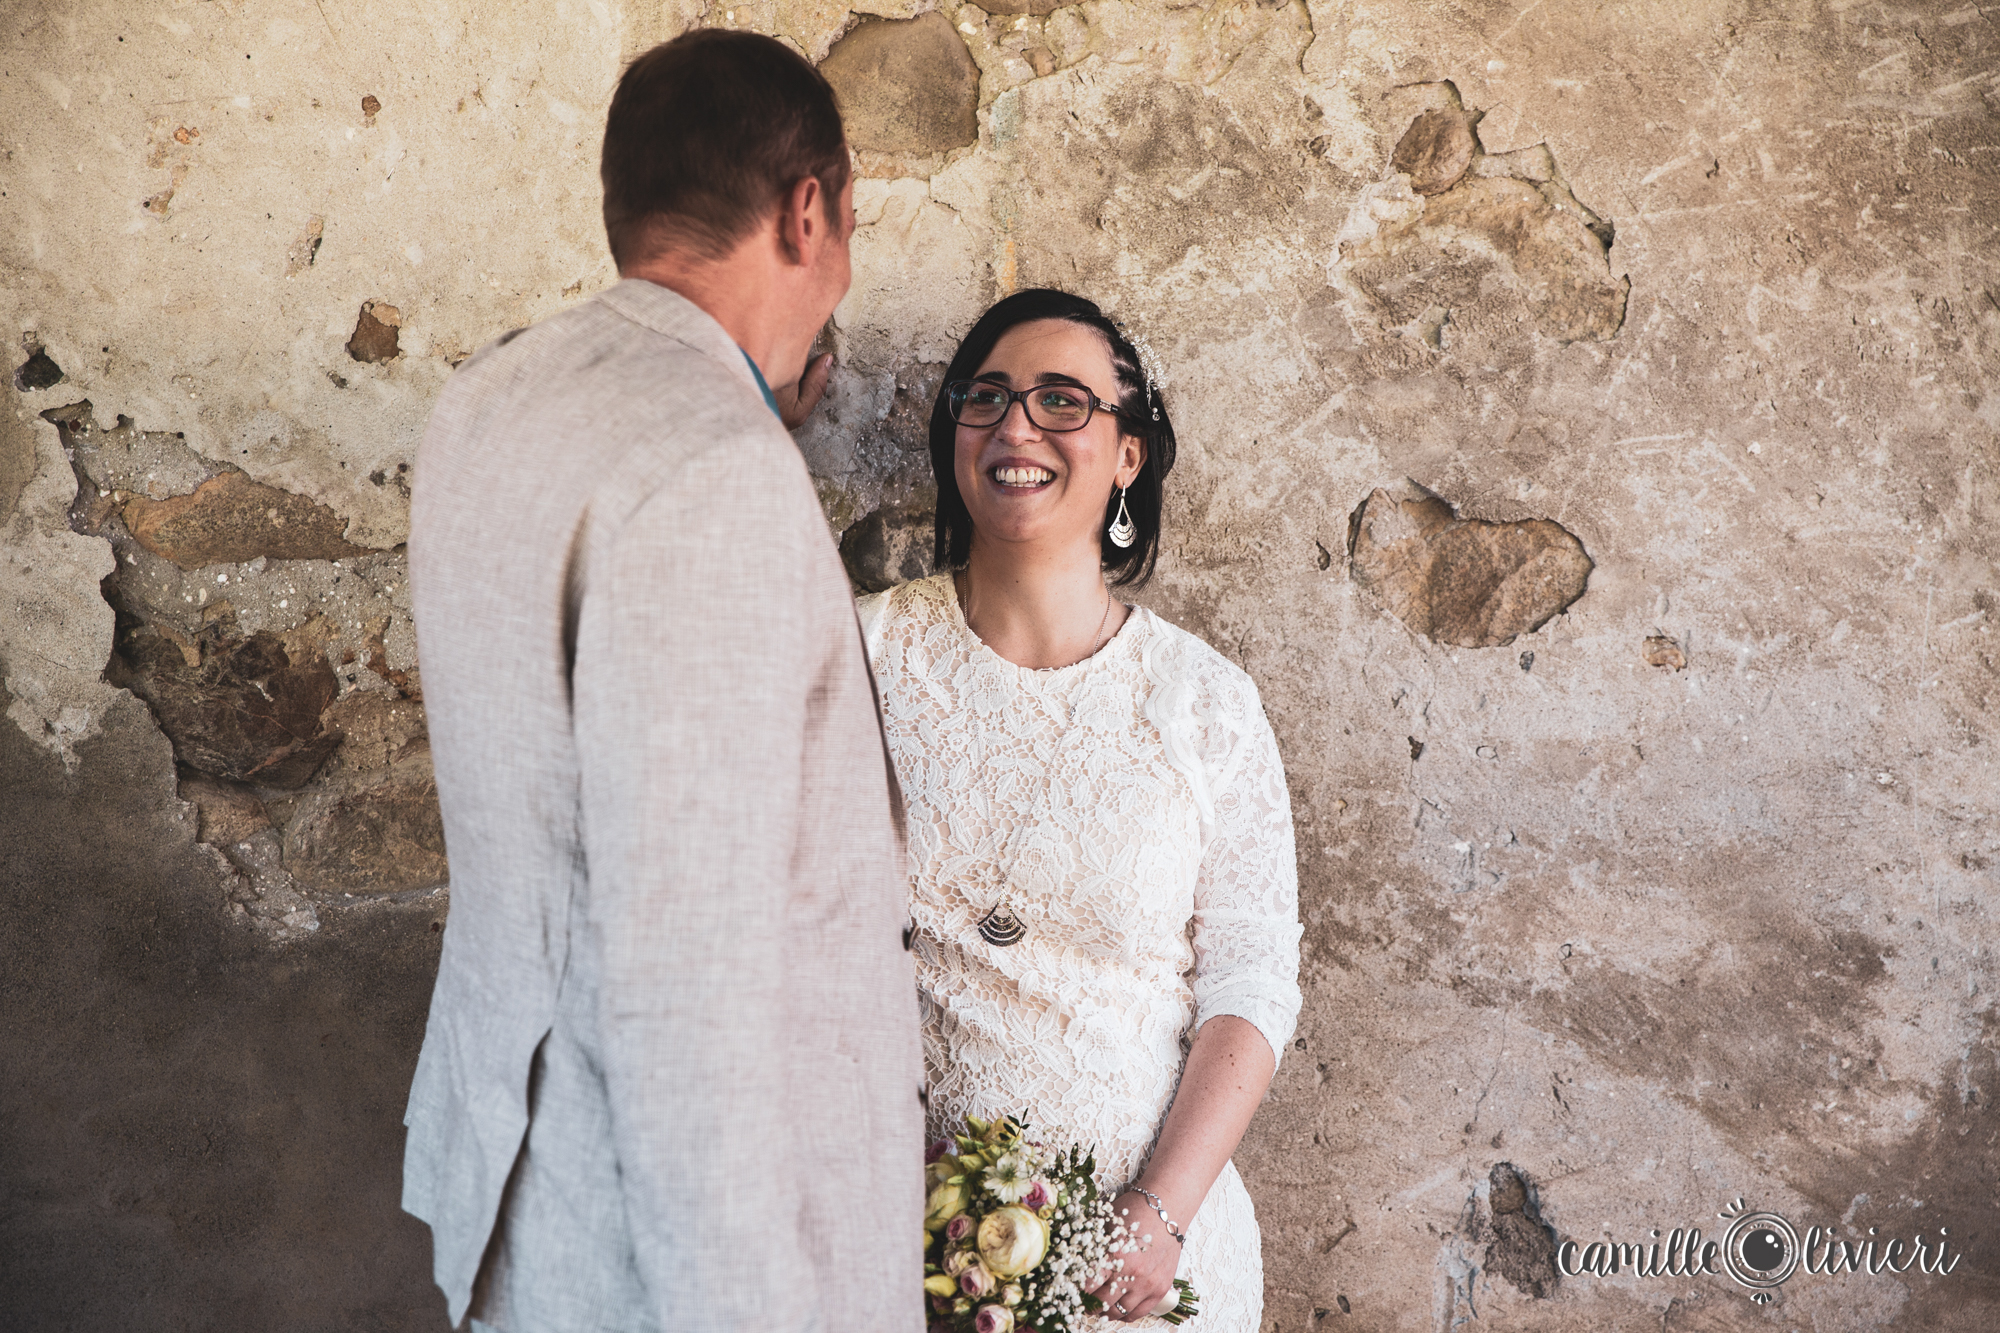 photographe_grenoble_mariage-camille-olivieri-53